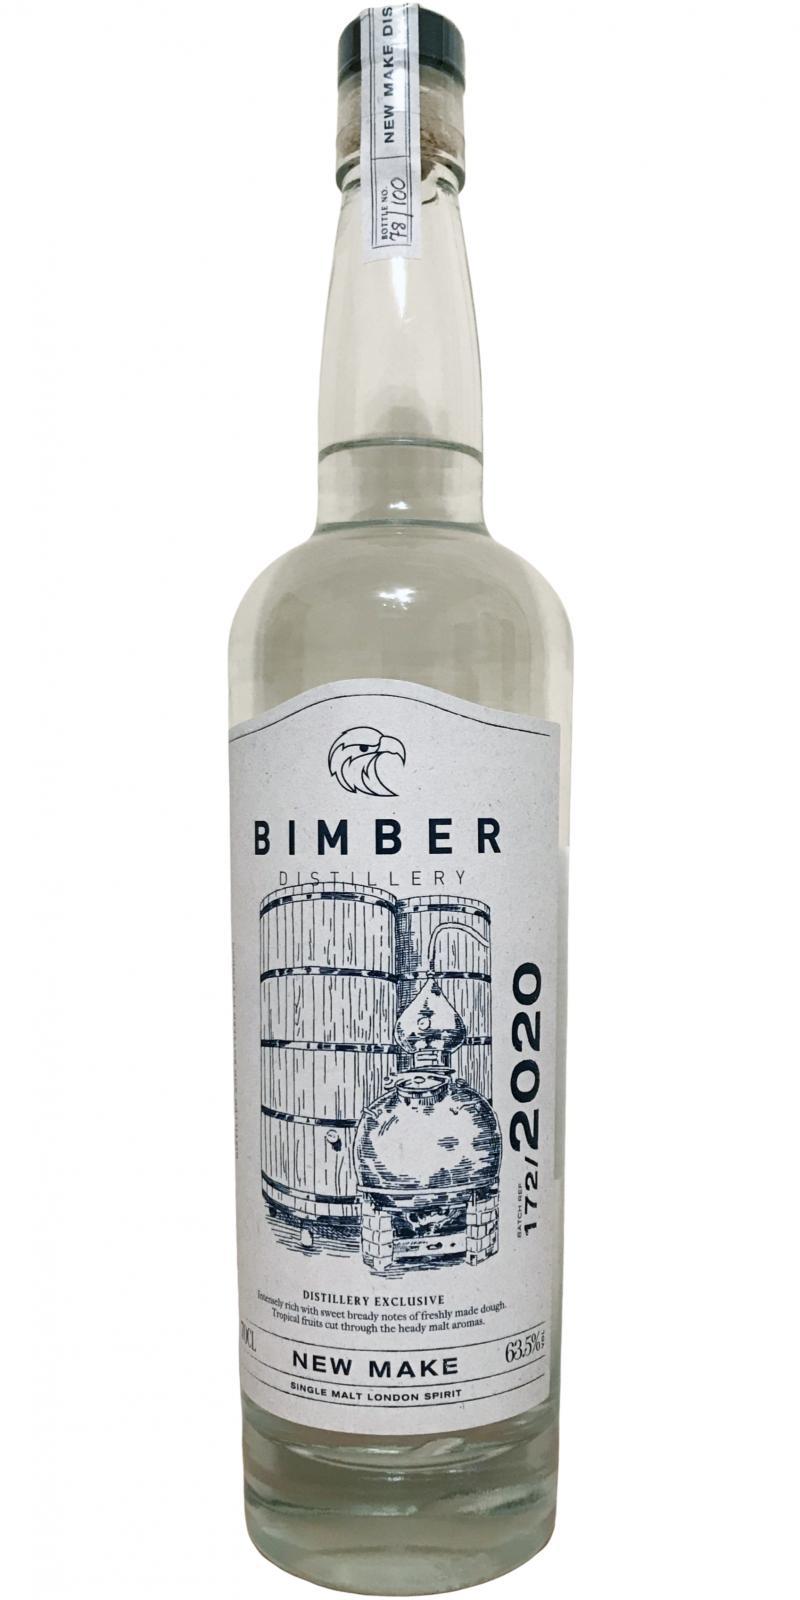 Bimber 2020 - New Make